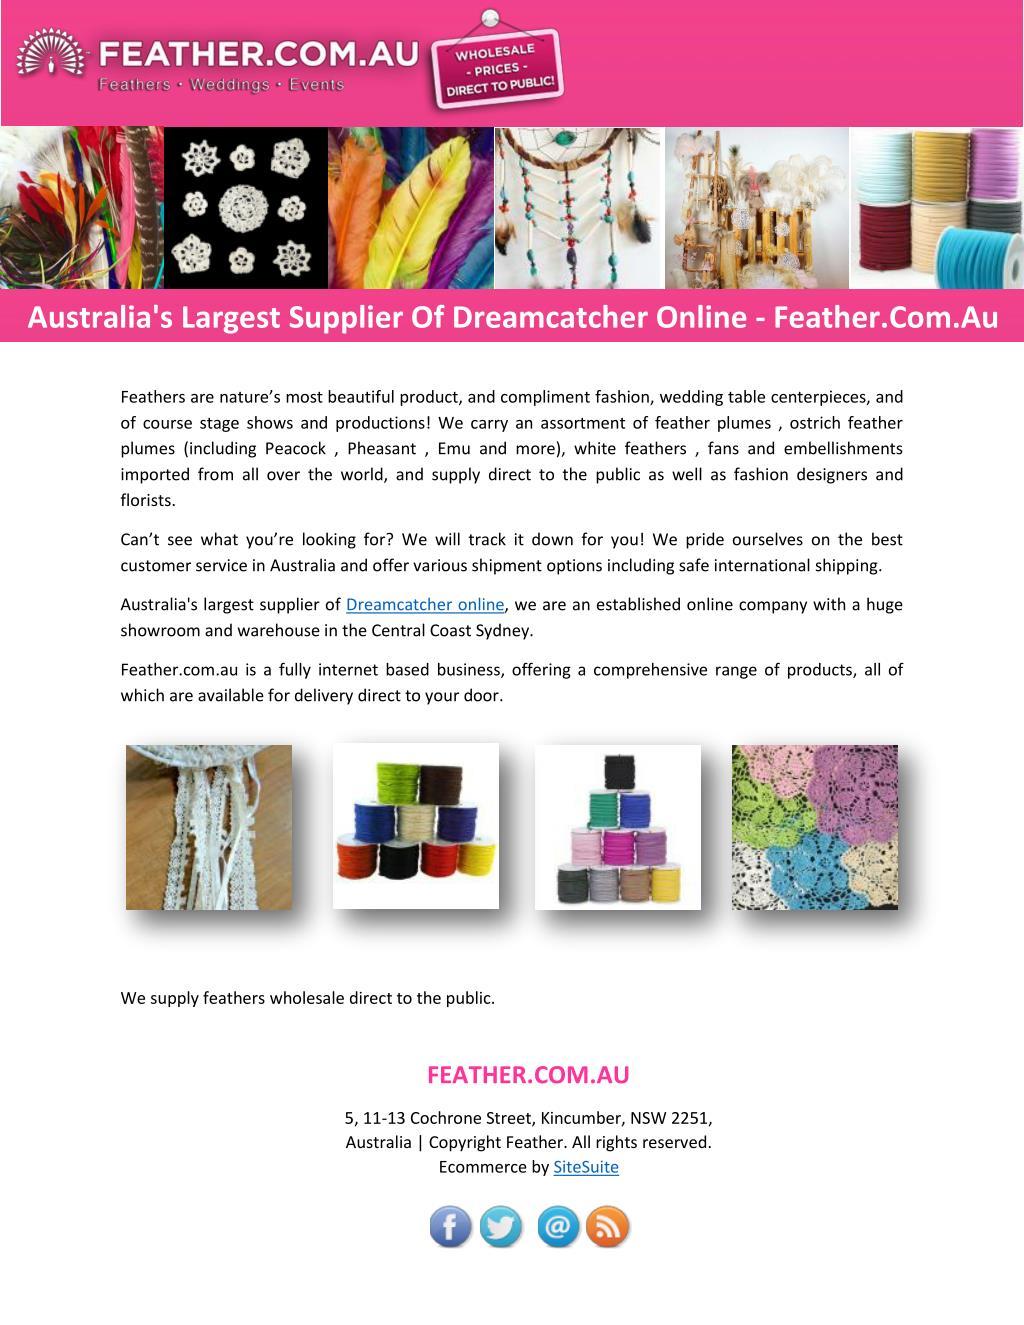 Ppt Australia S Largest Supplier Of Dreamcatcher Online Feather Com Au Powerpoint Presentation Id 7428321